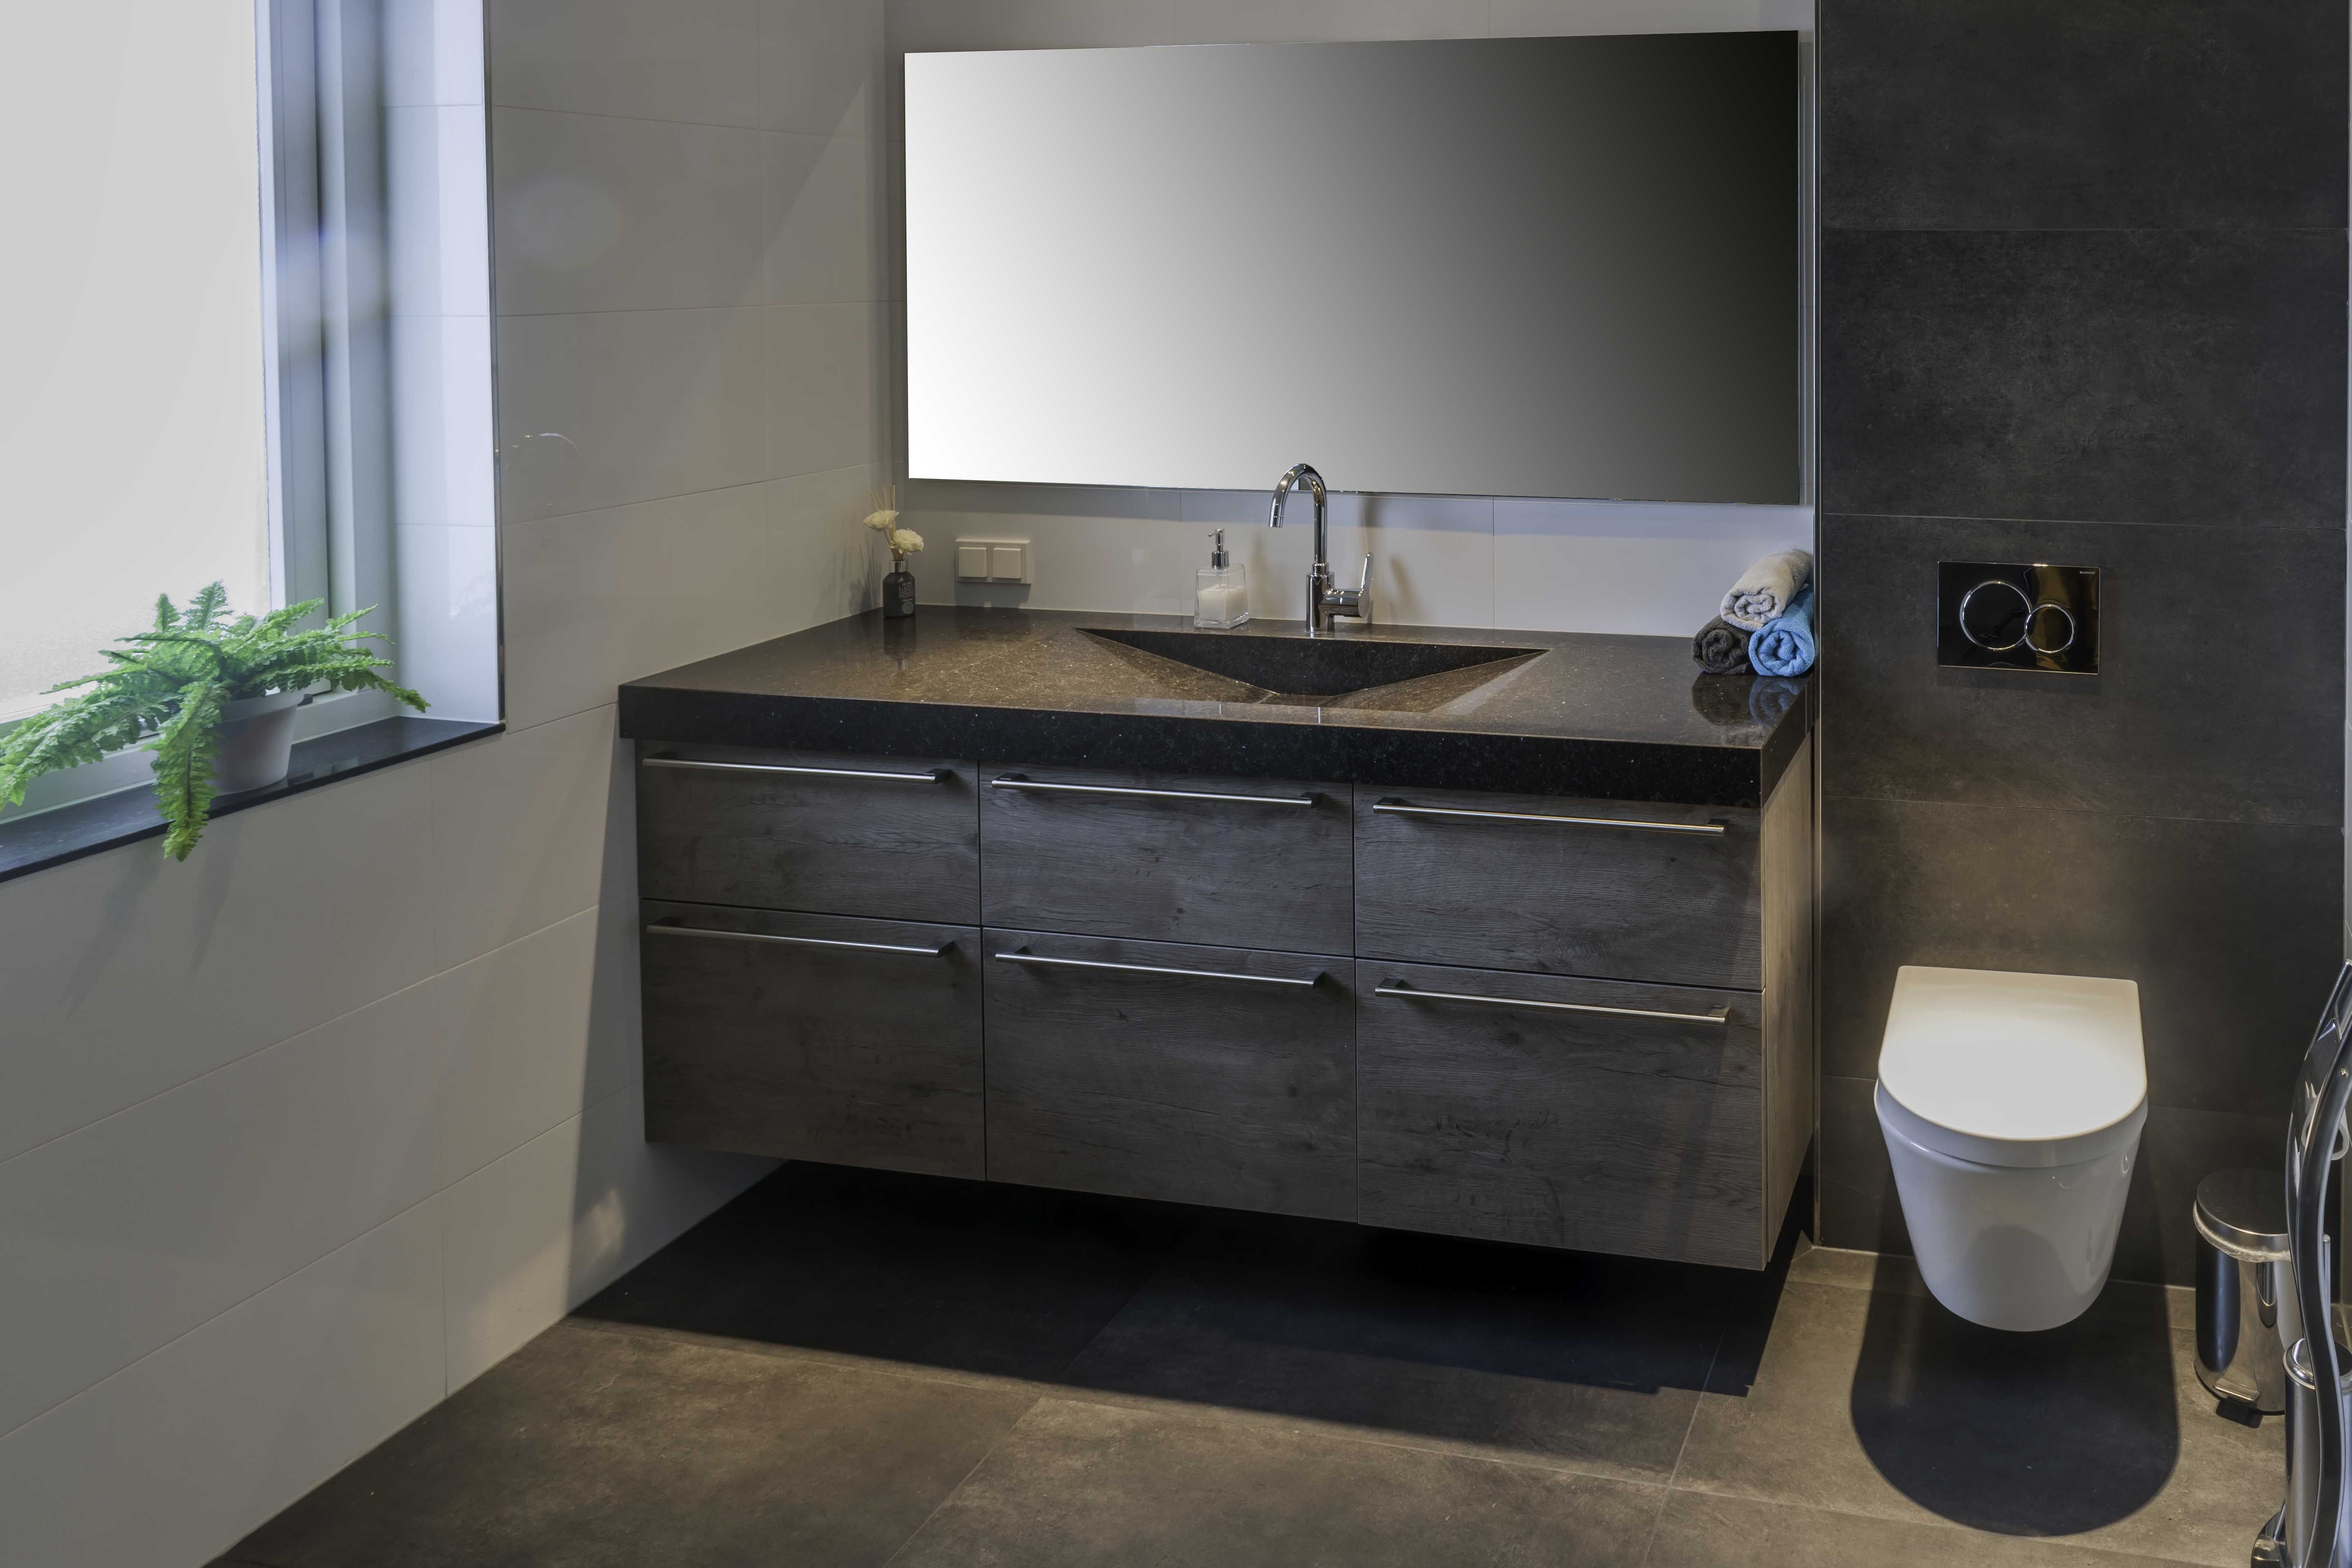 Badkamer showroom regio zeeland - Foto badkamer meubels ...